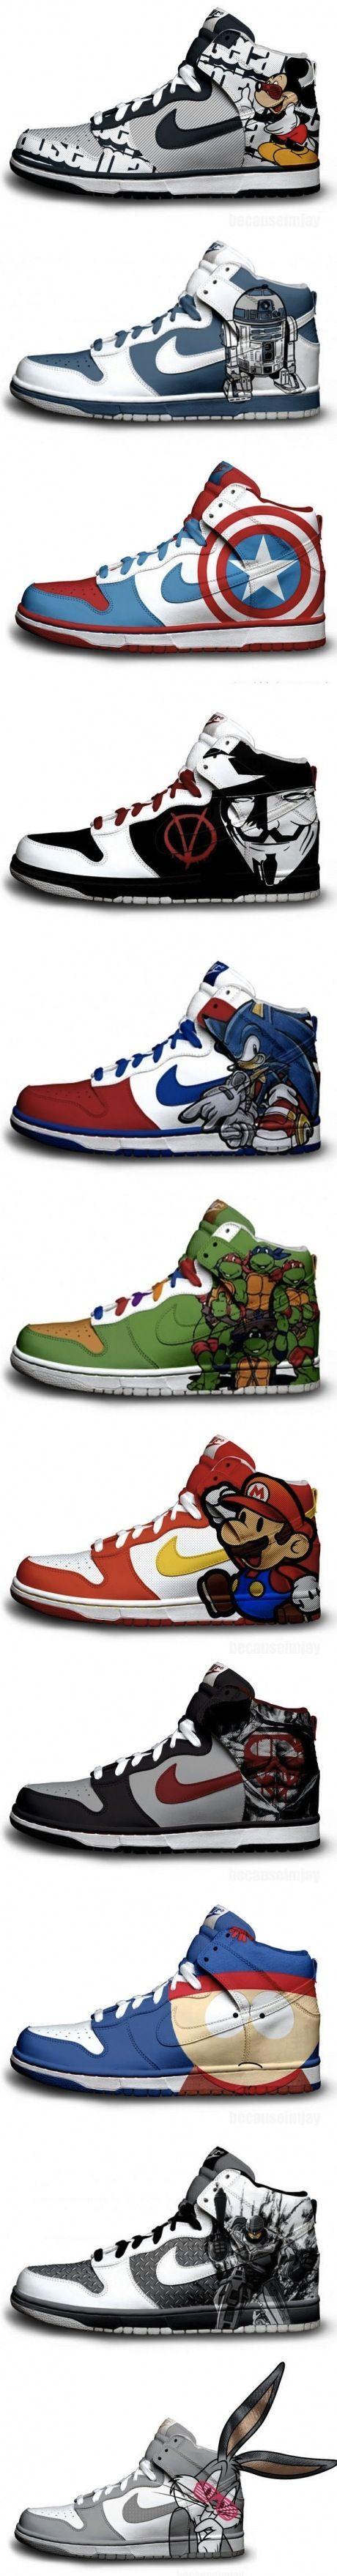 Shoes and shoes and shoes and shoes.